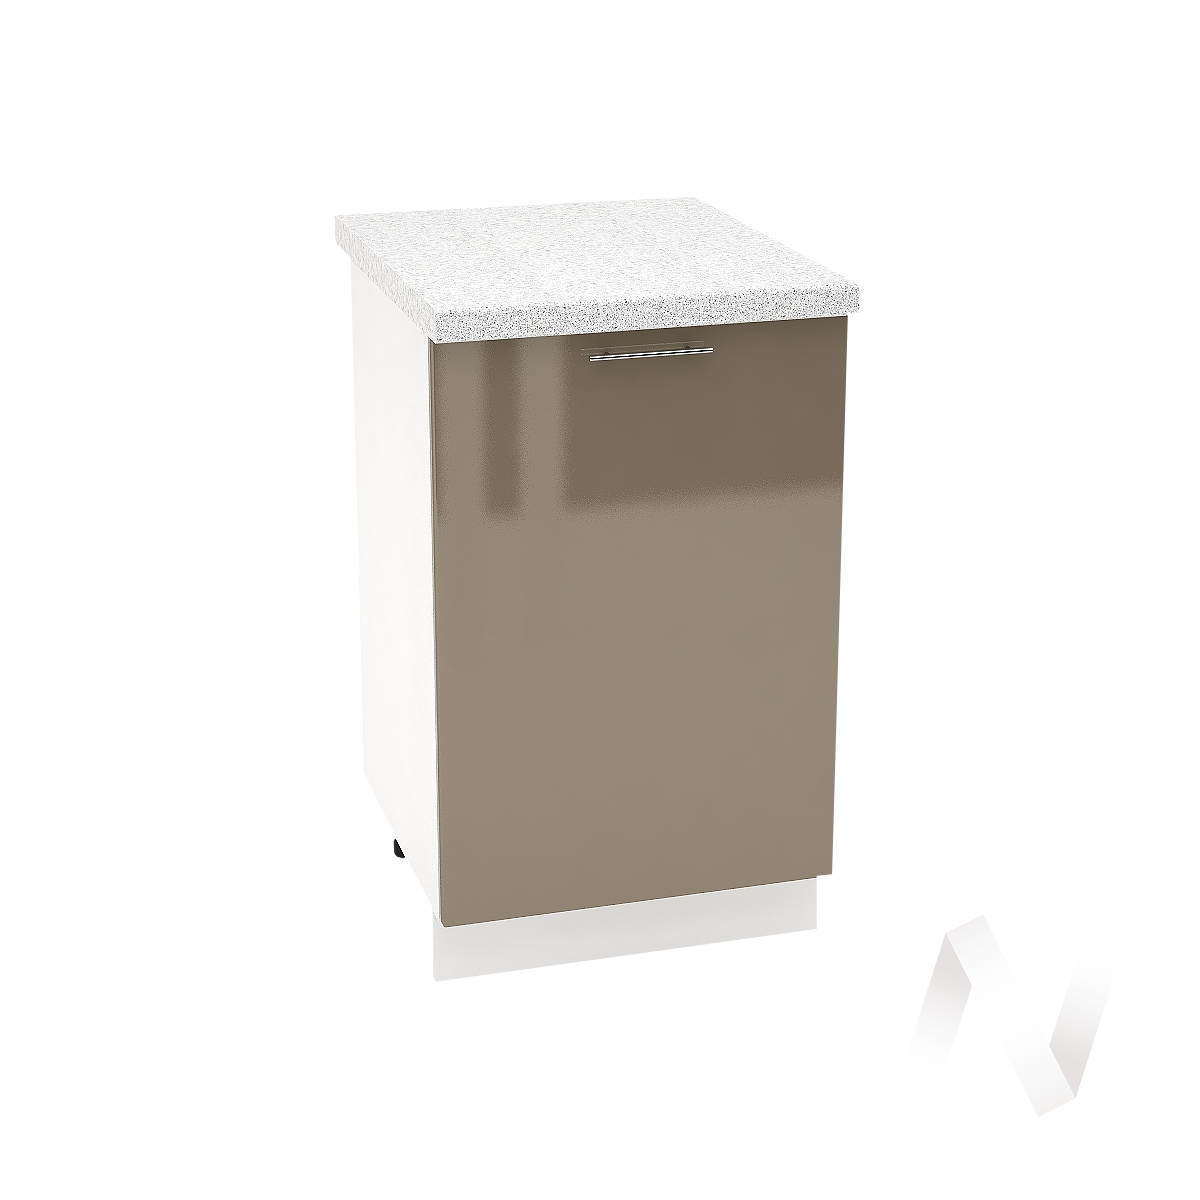 "Кухня ""Валерия-М"": Шкаф нижний 500, ШН 500 (Капучино глянец/корпус белый)"